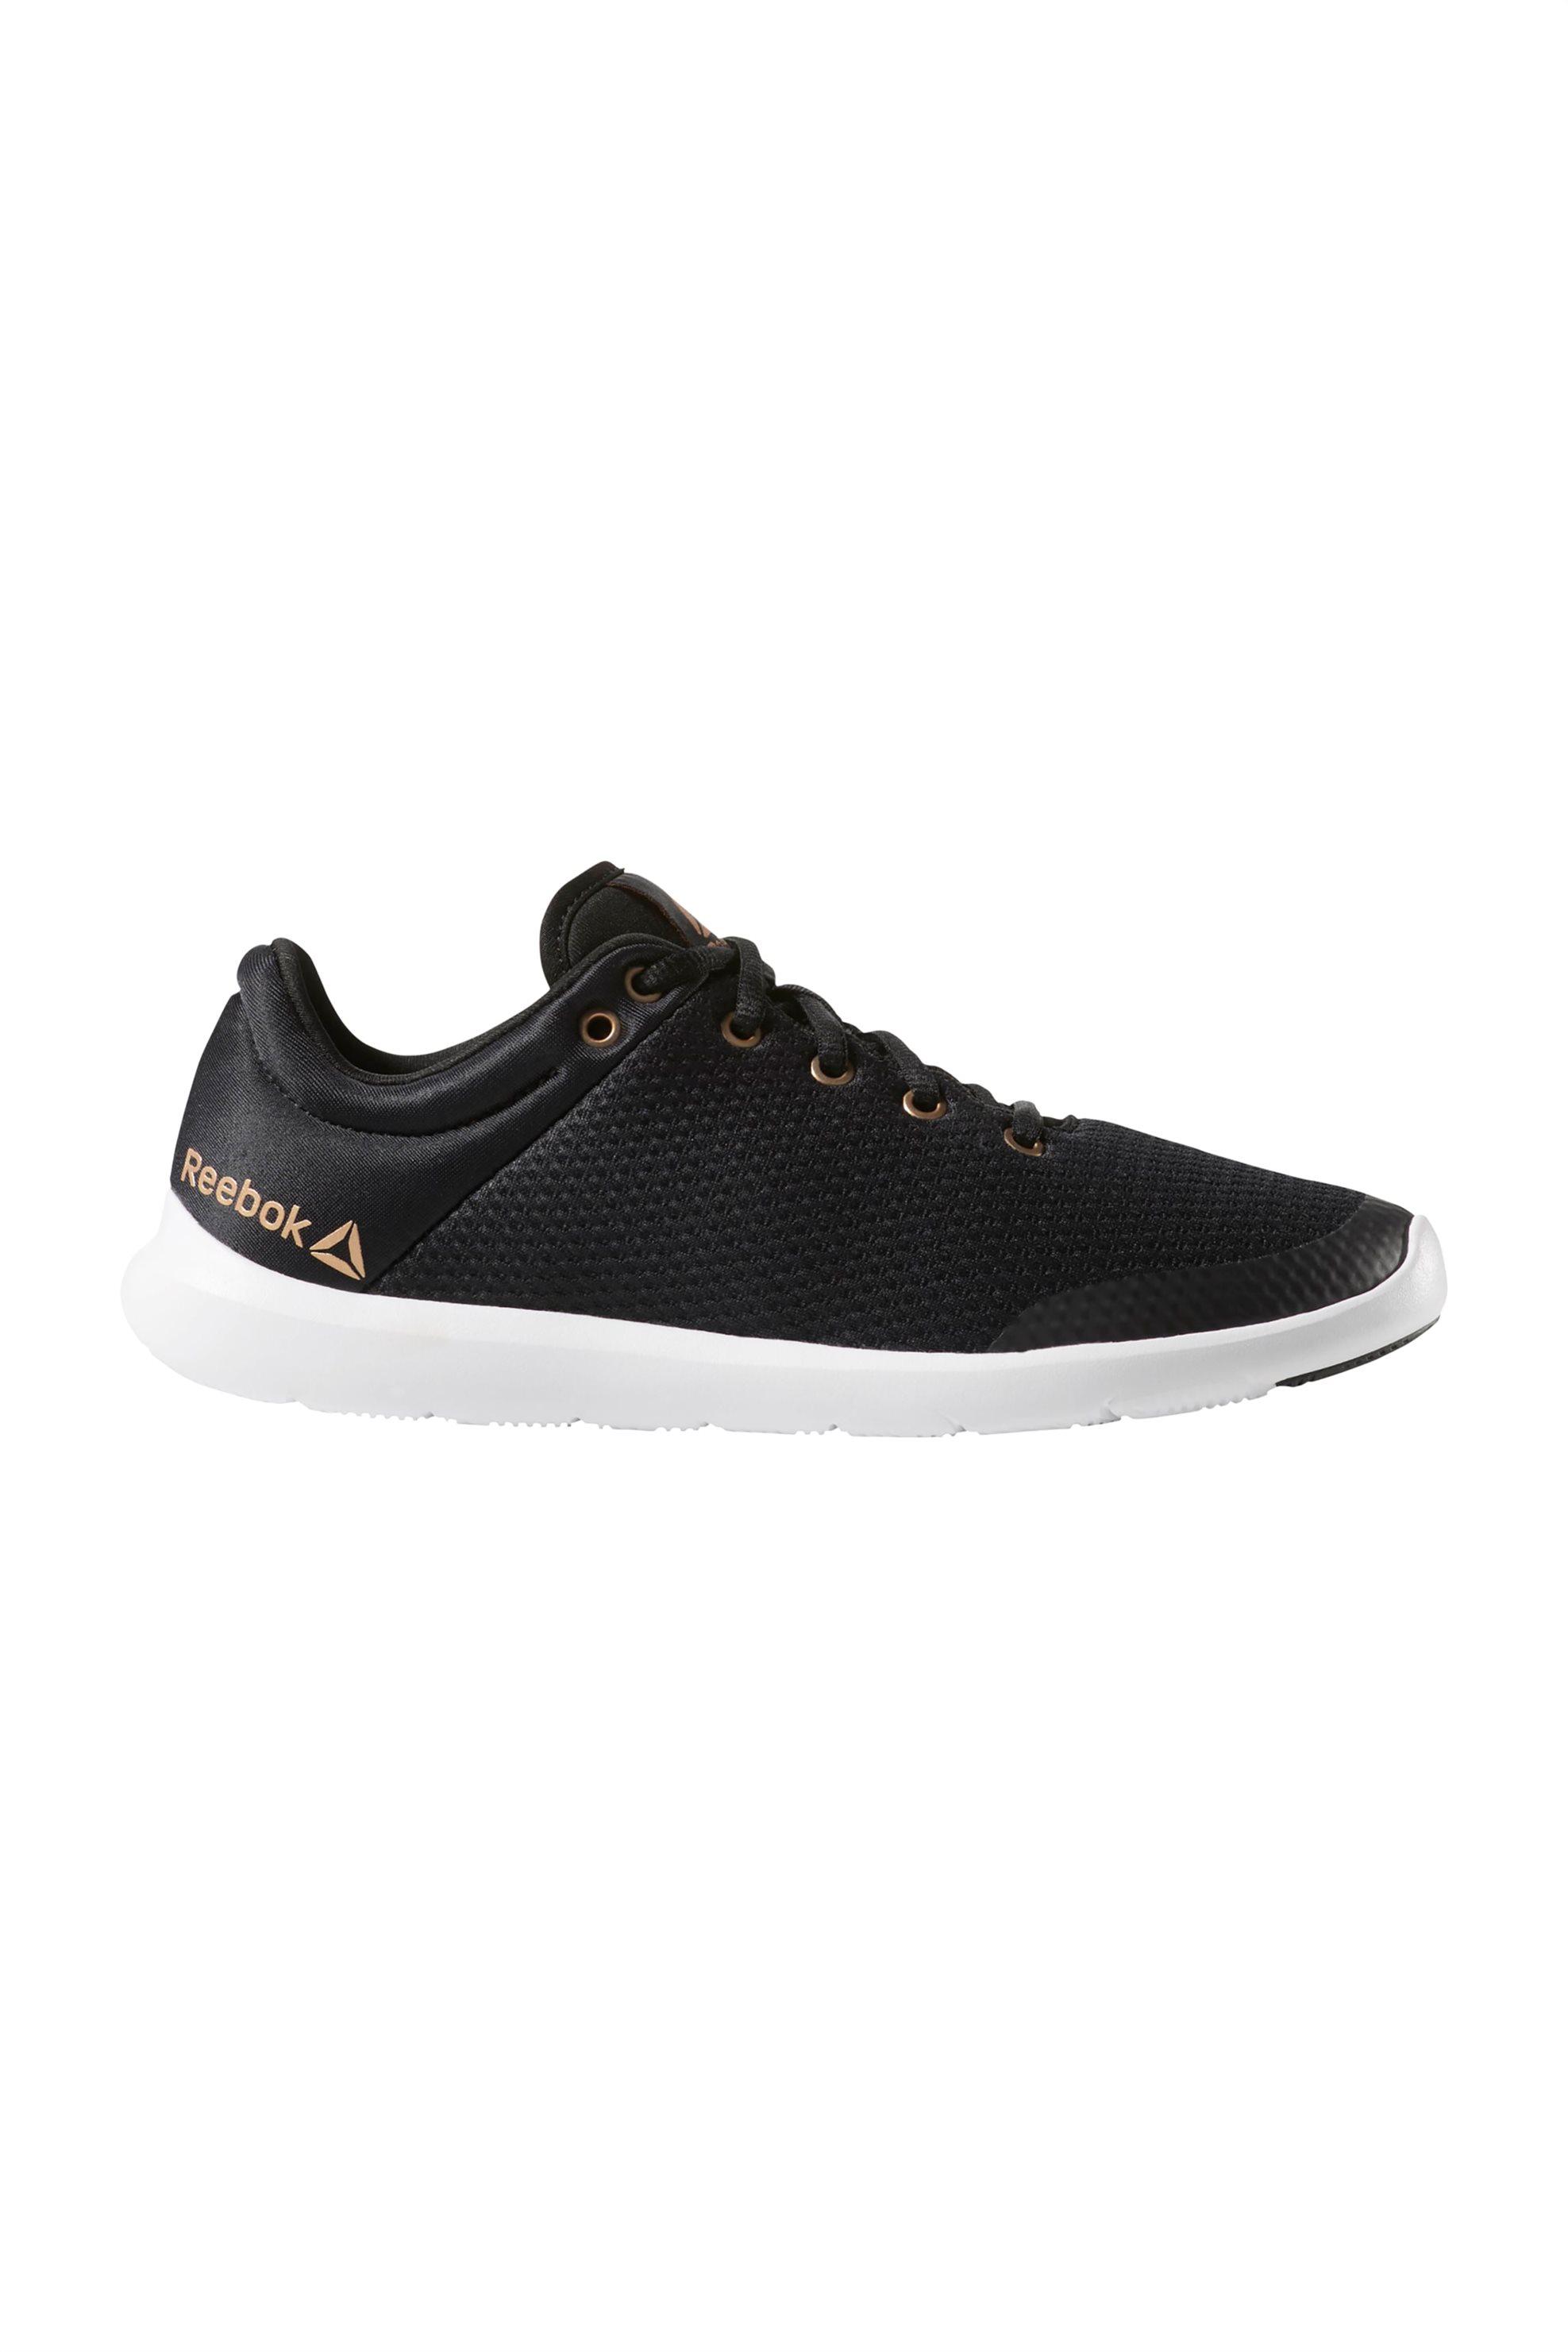 Reebok γυναικεία αθλητικά παπούτσια Studio Basics - CN6668 - Μαύρο γυναικα   αθλητικα   αθλητικά παπούτσια   training   walking